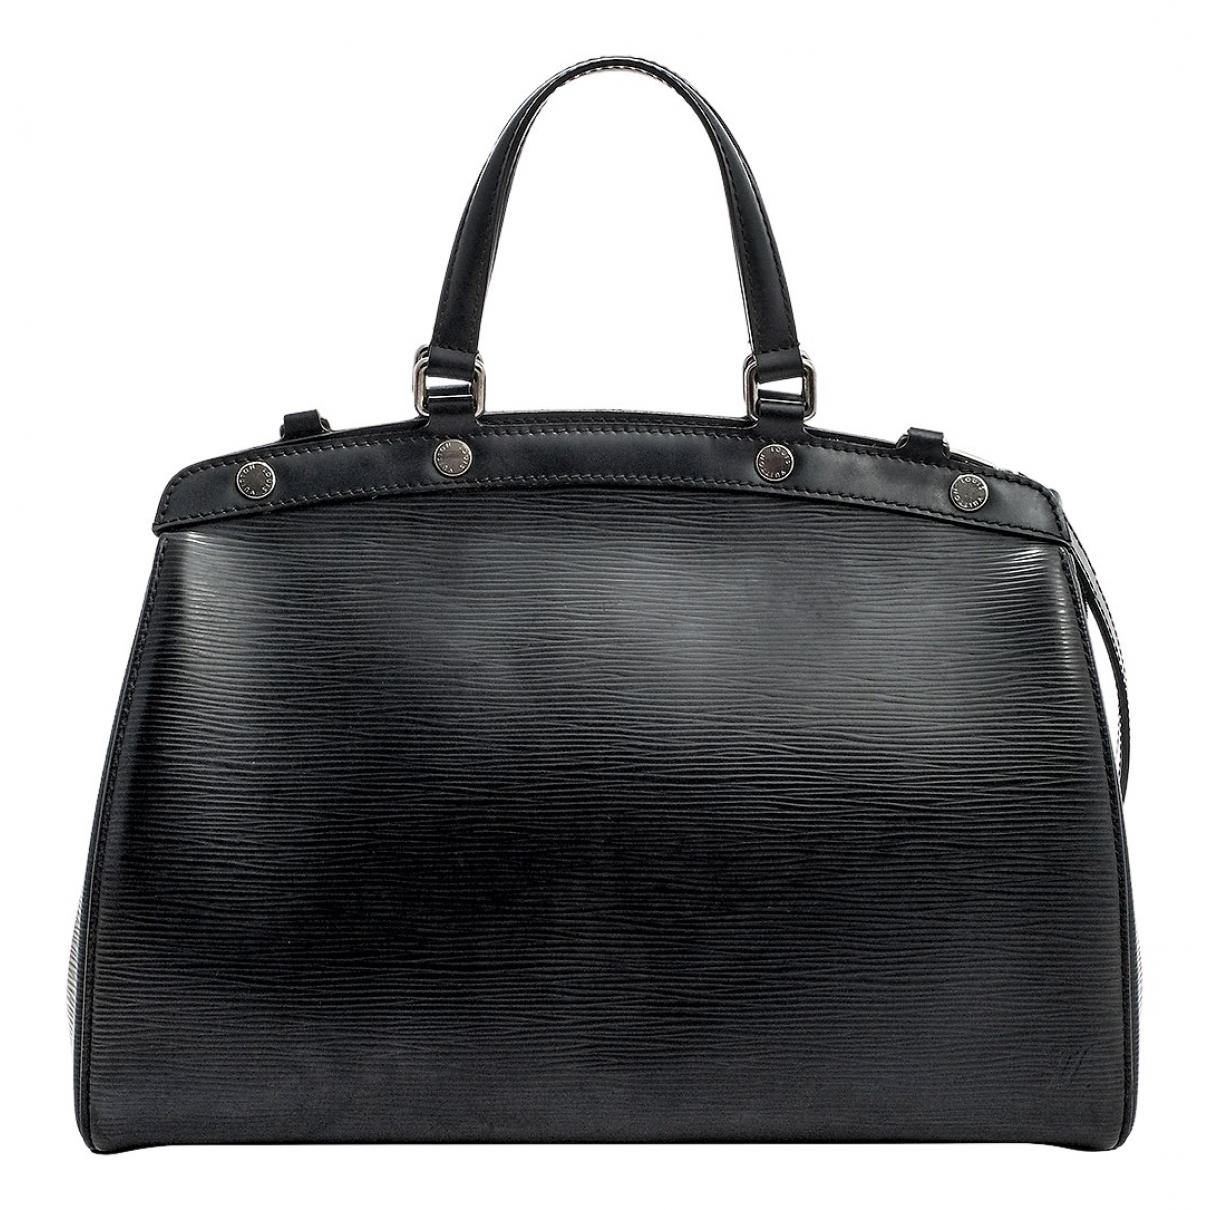 Louis Vuitton Bréa Black Leather handbag for Women \N